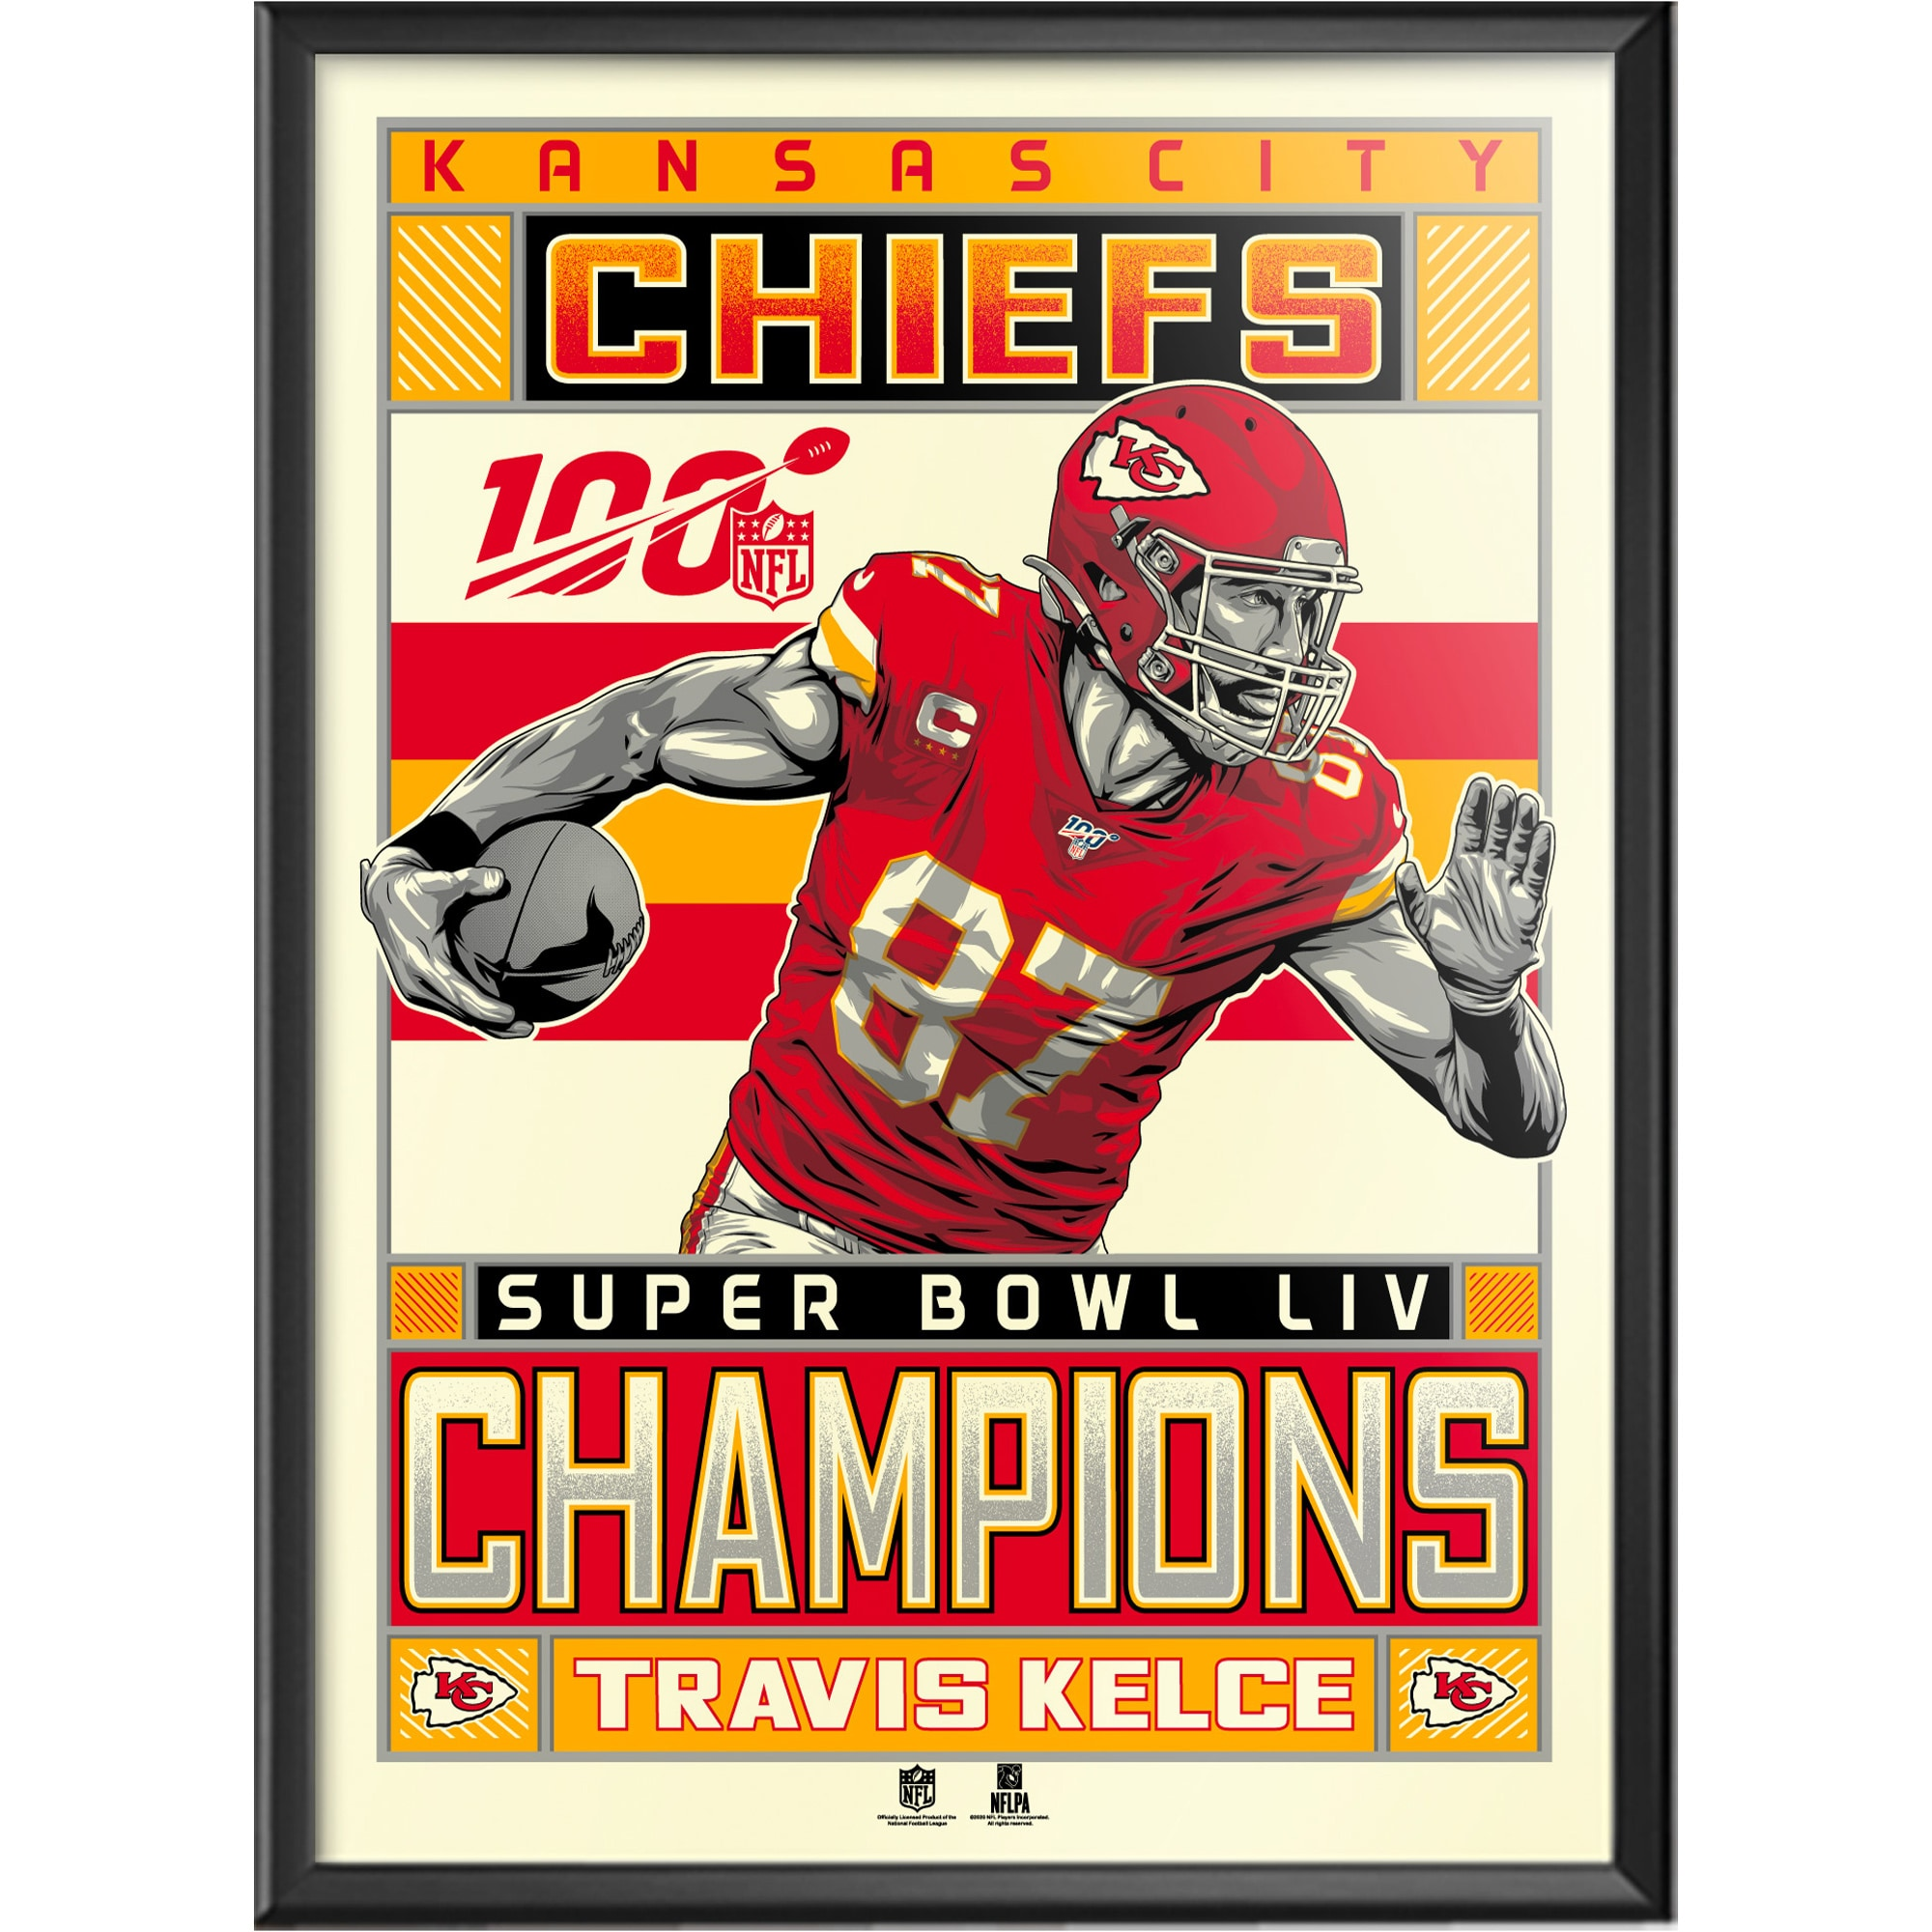 travis kelce kansas city chiefs super bowl liv champions limited edition 18 x 24 serigraph framed poster walmart com